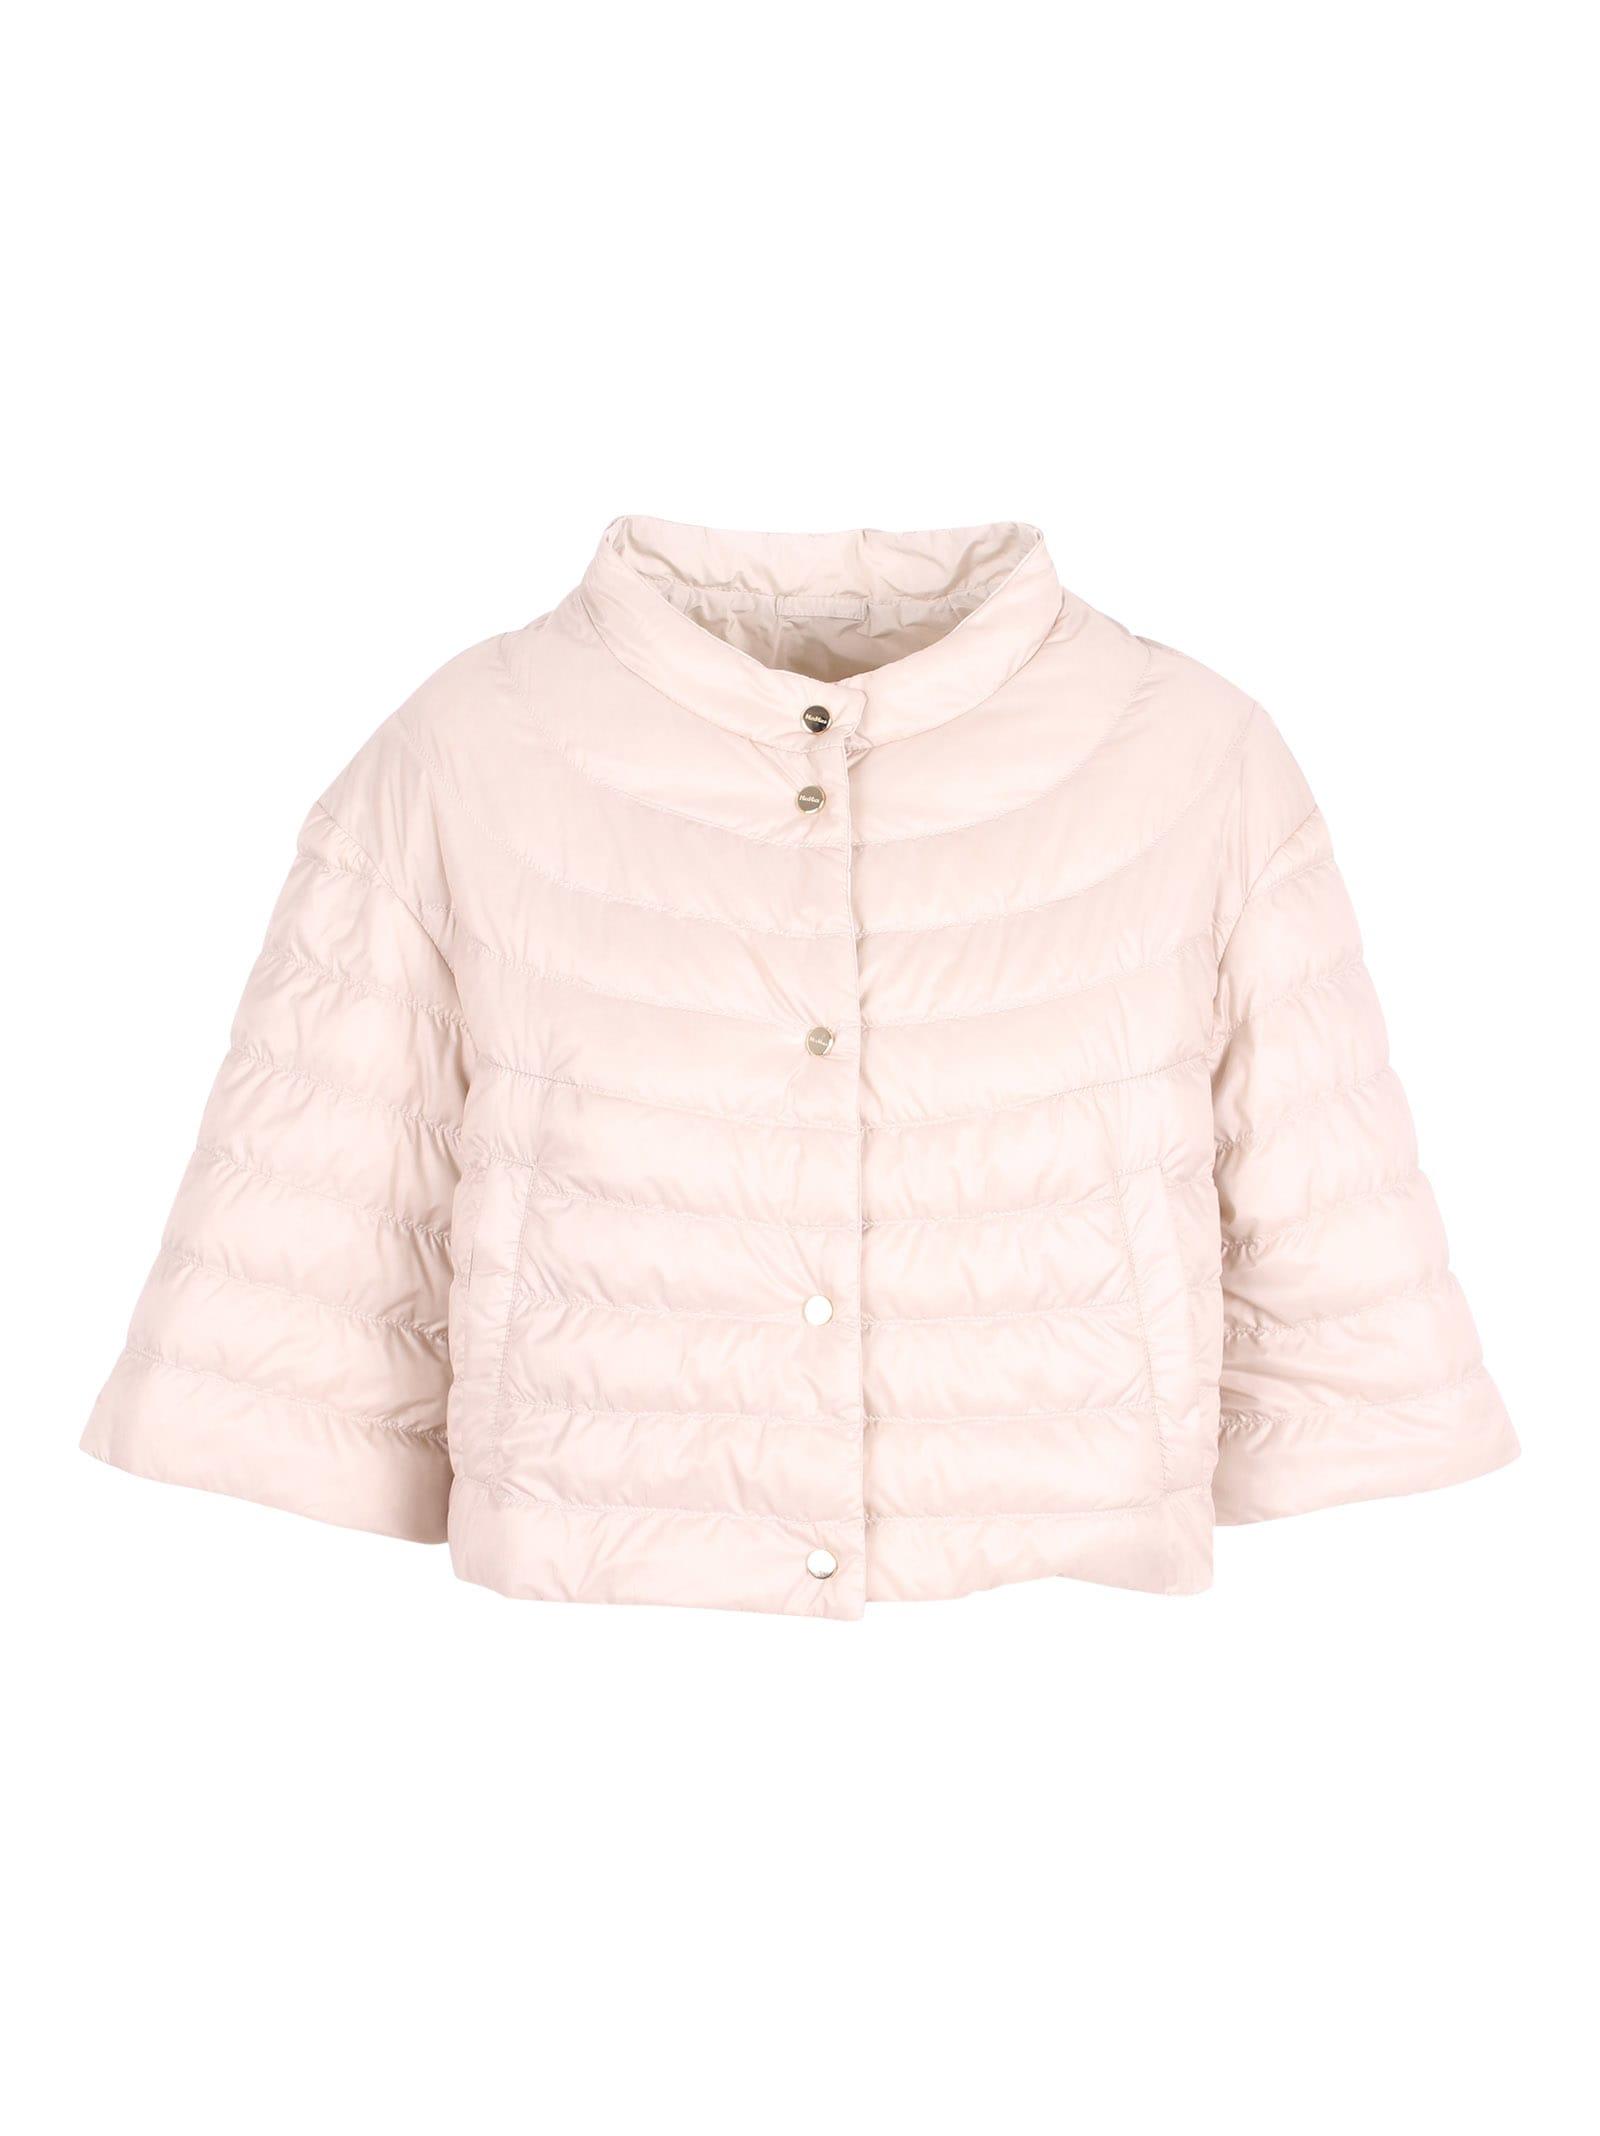 disoft Polyamide Jacket